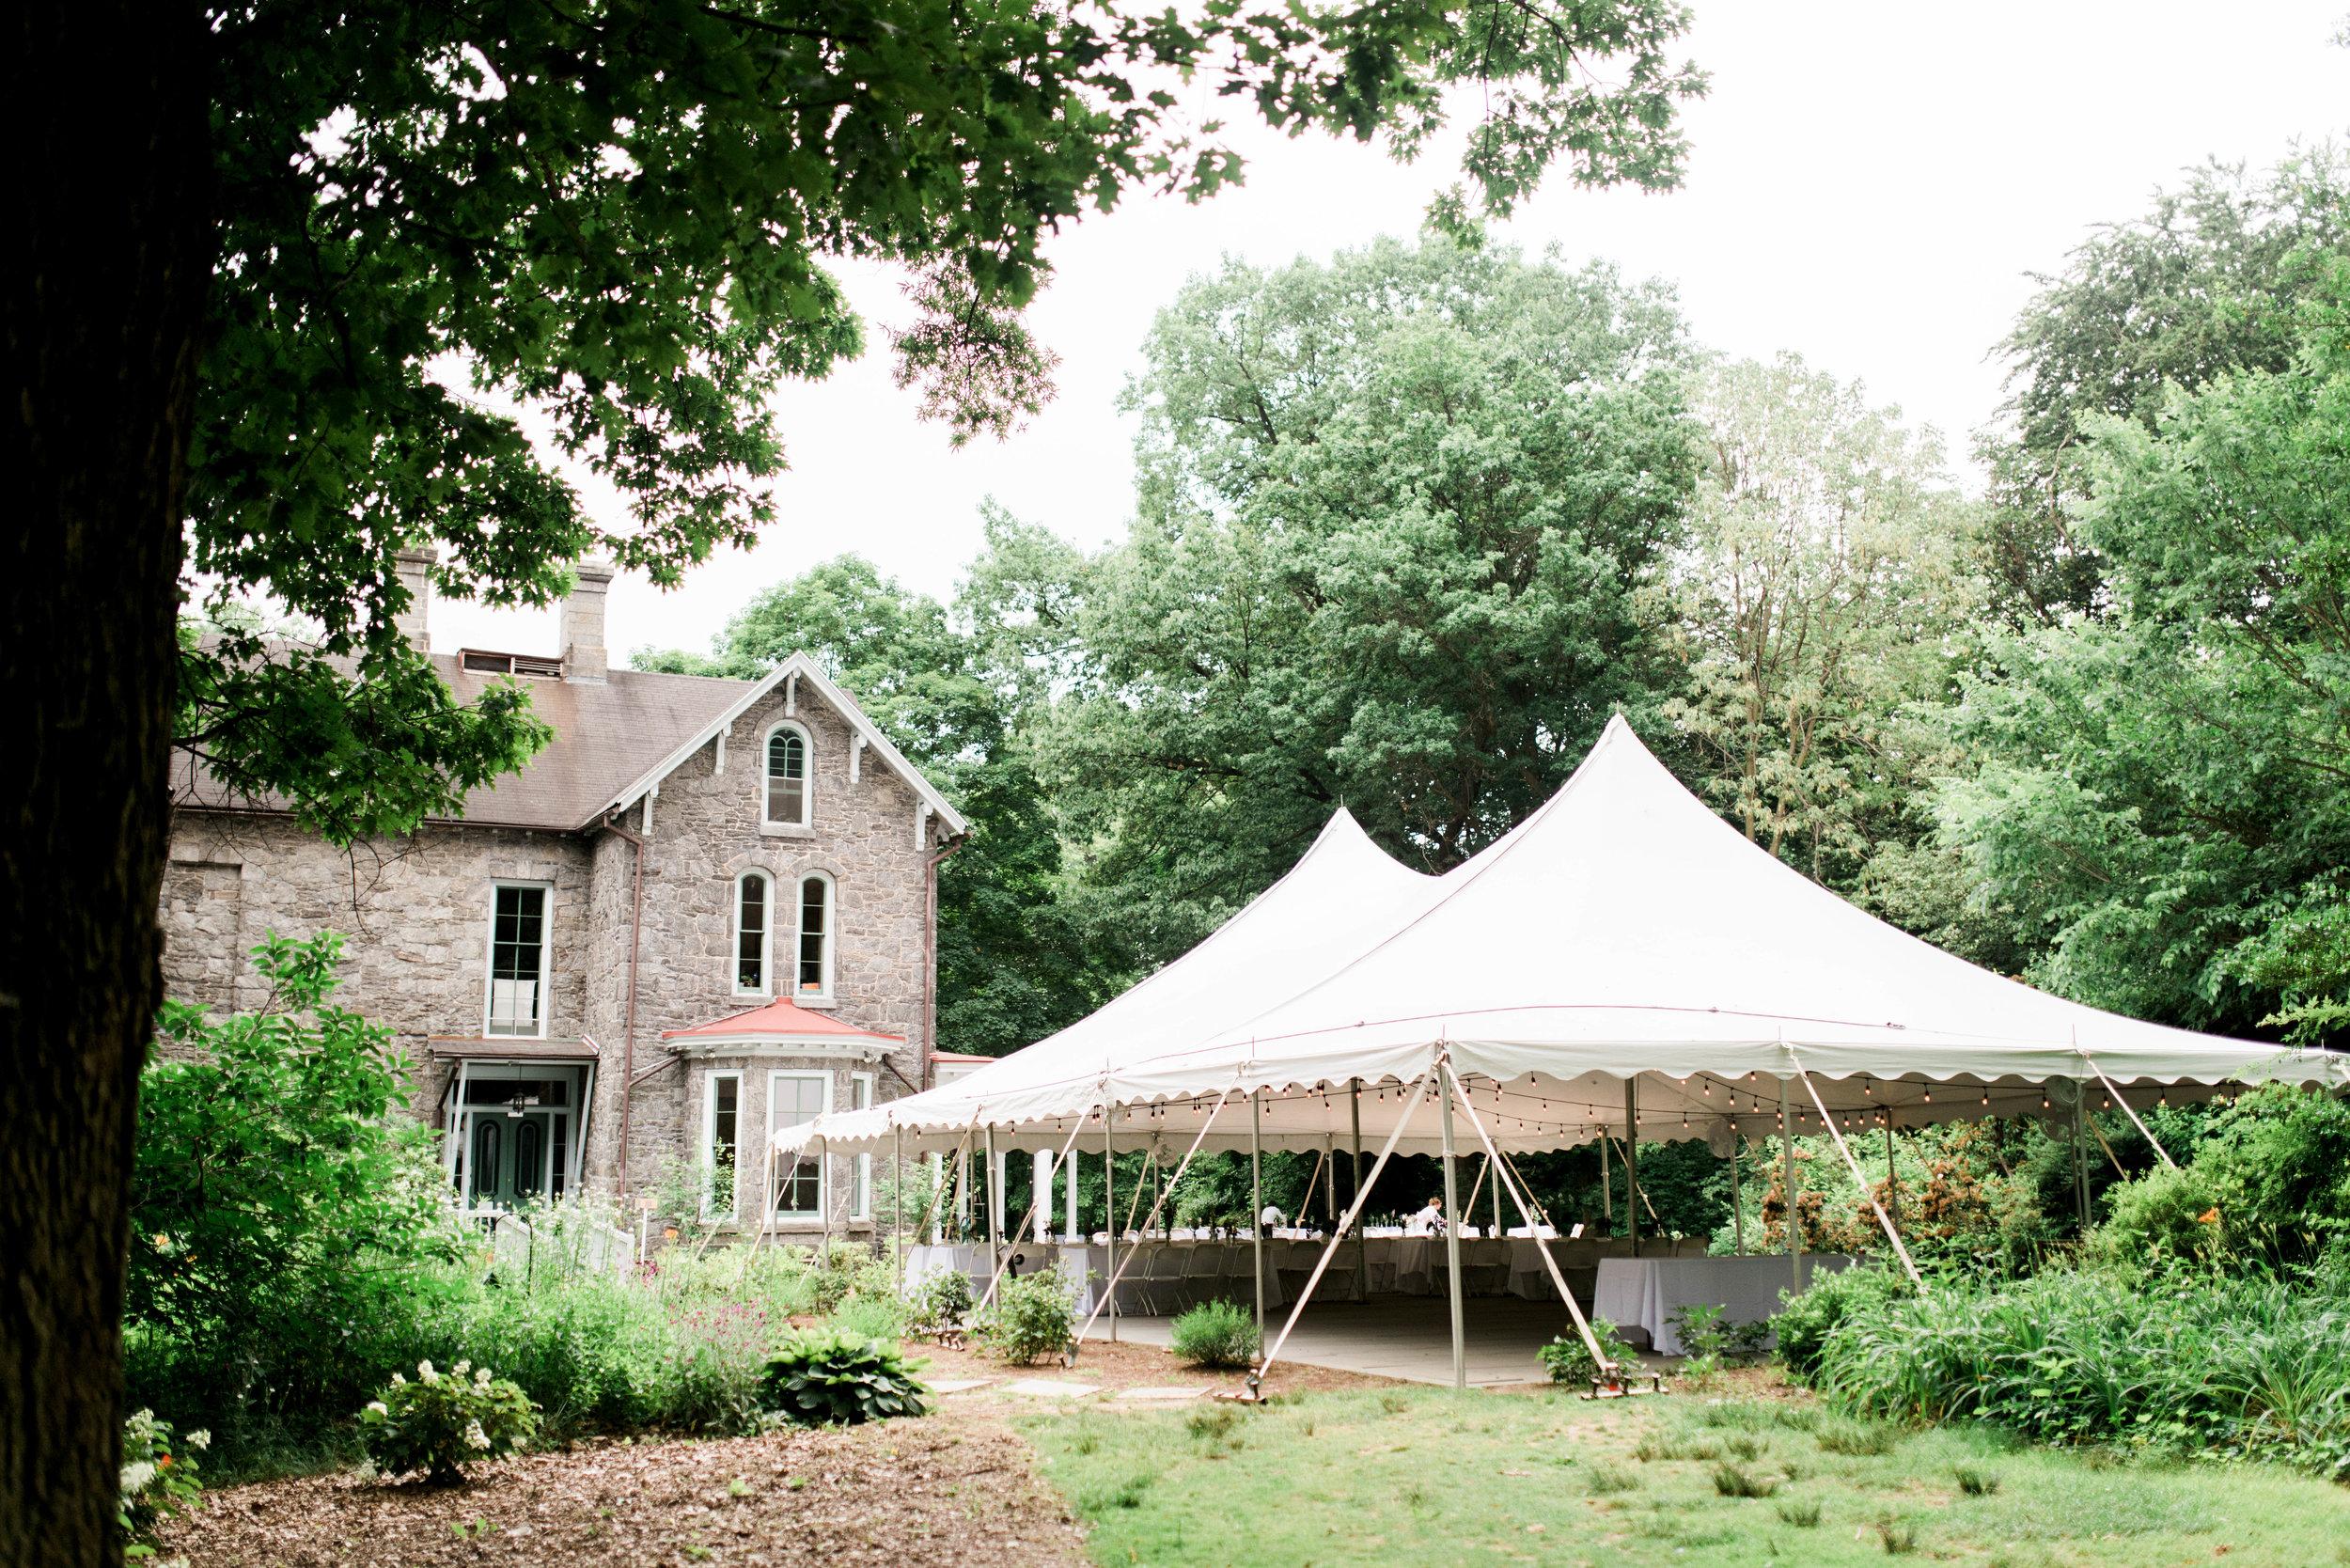 awbury-arboretum-wedding-DIY-boho-summer-haley-richter-photography-020.jpg